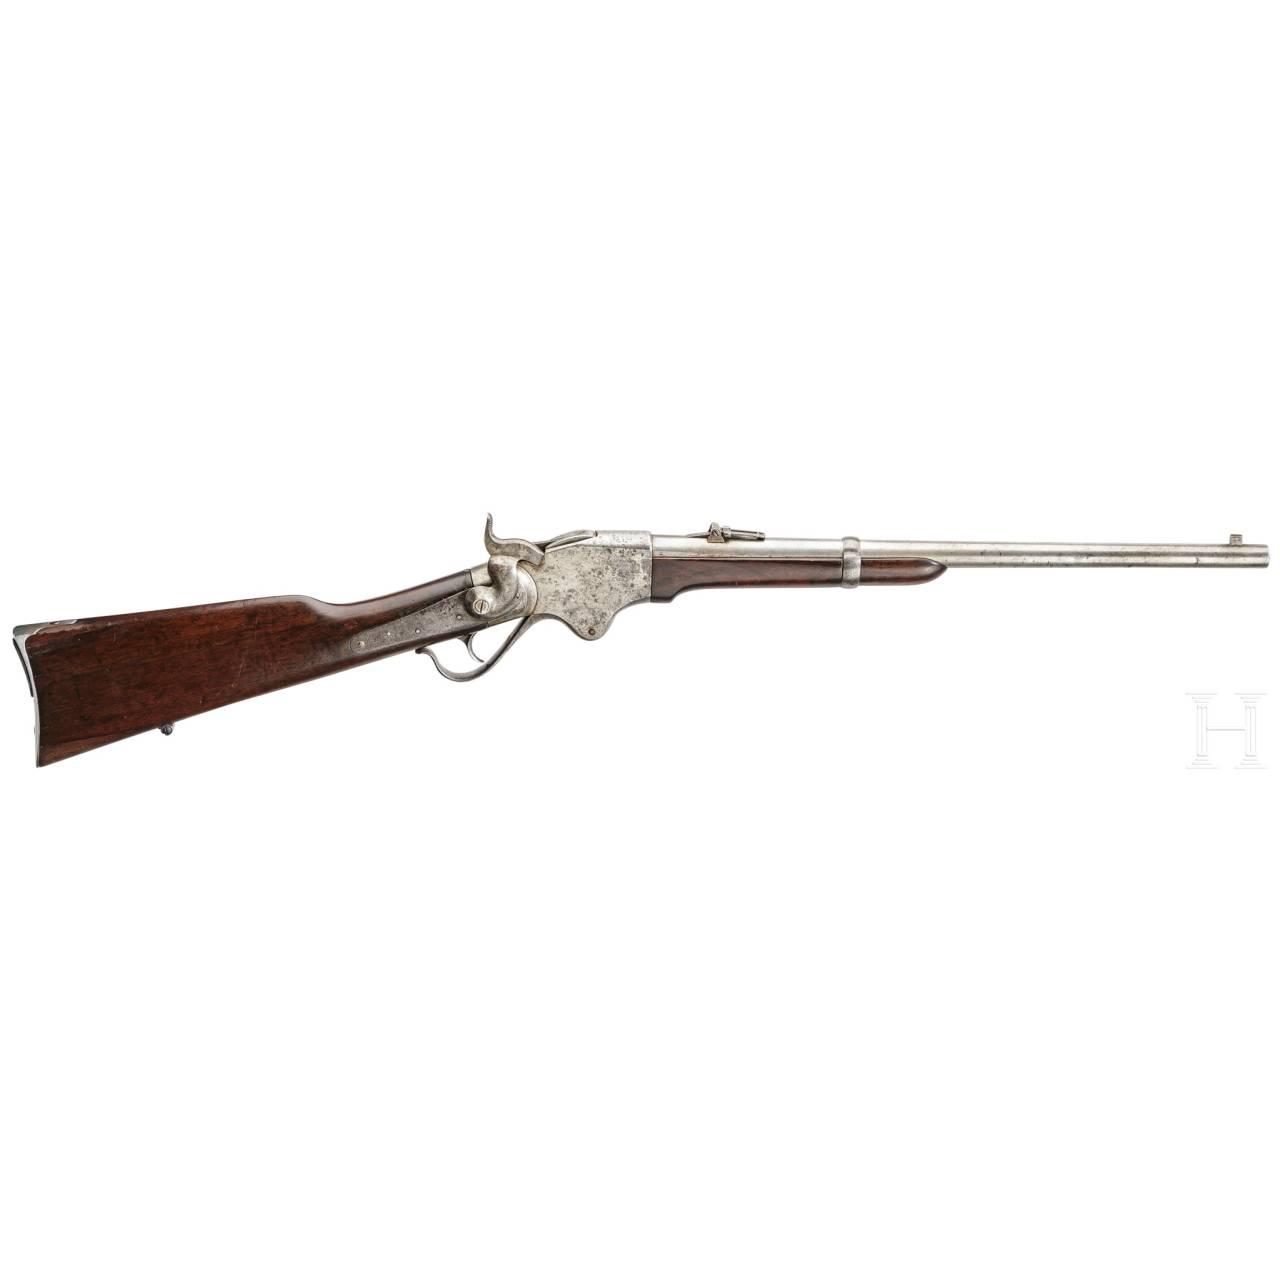 A Spencer Carbine Model 1865